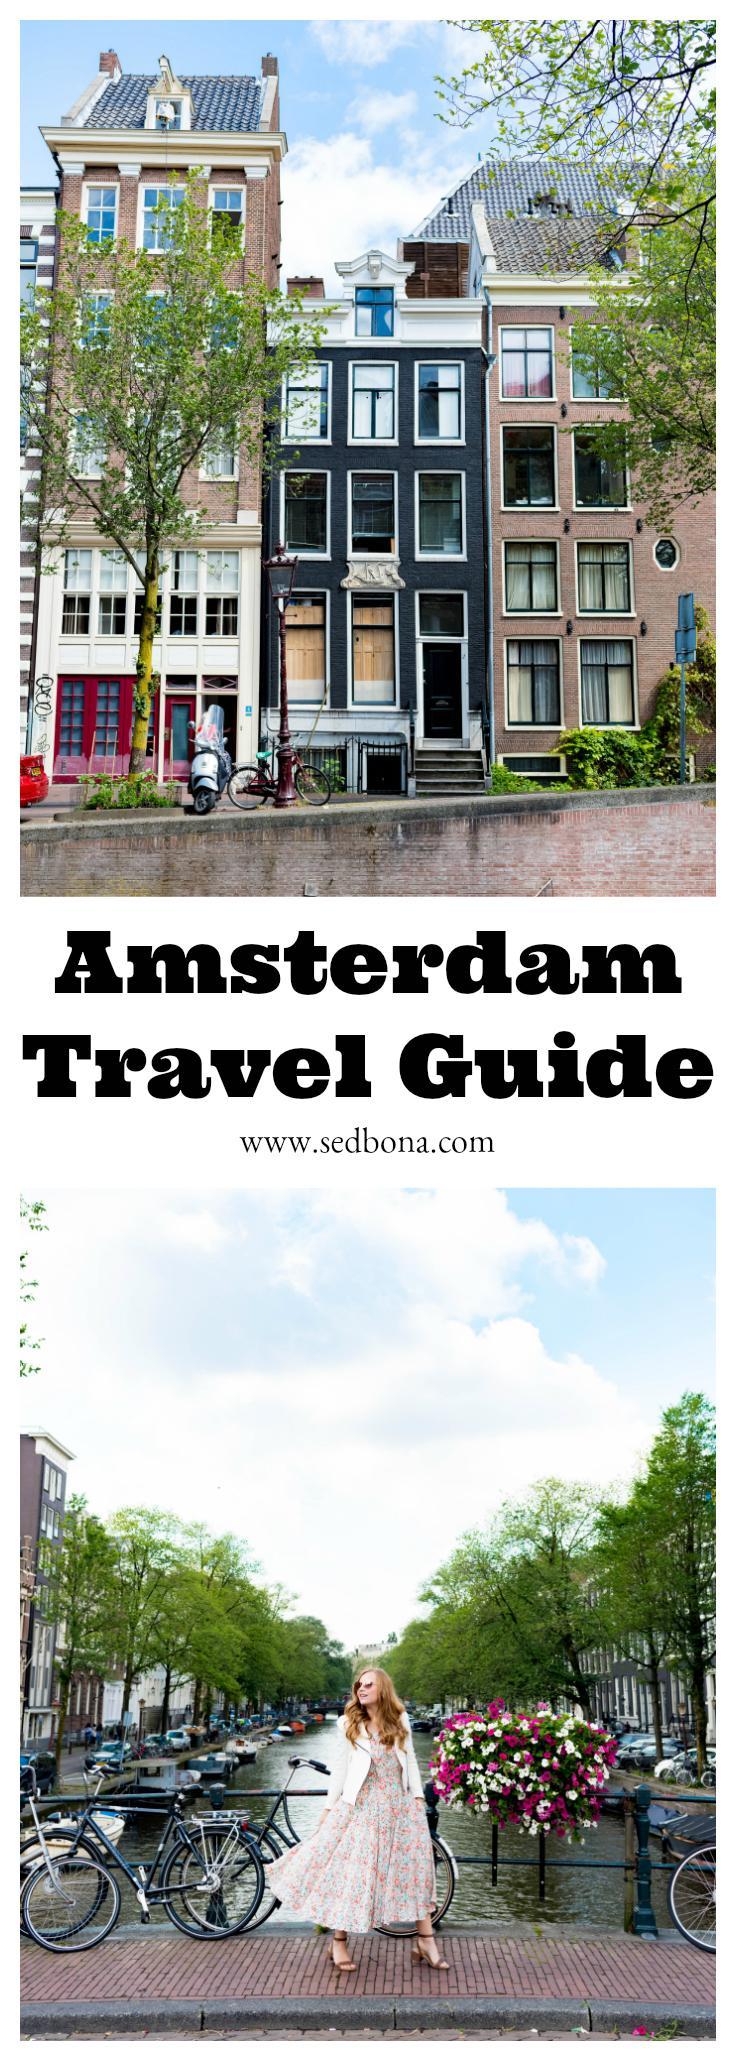 Amsterdam Travel Guide Sed Bona